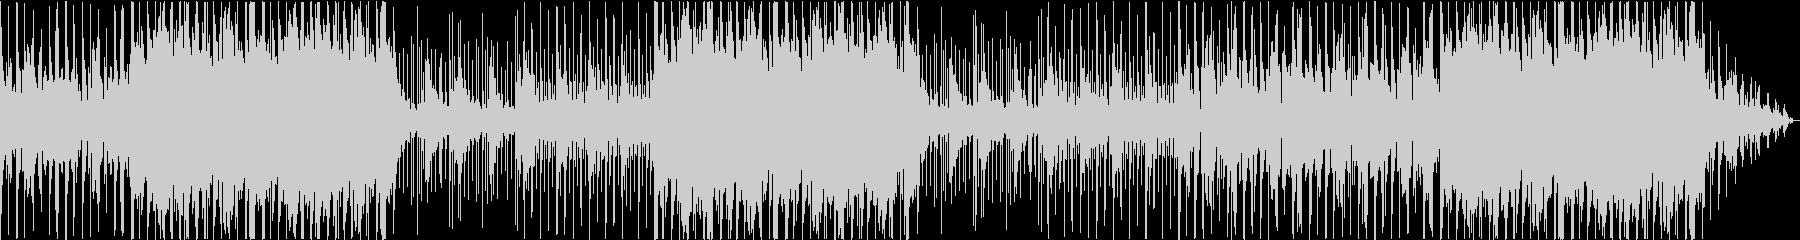 Guitar, electric piano, Lofi, adult, cafe's unreproduced waveform